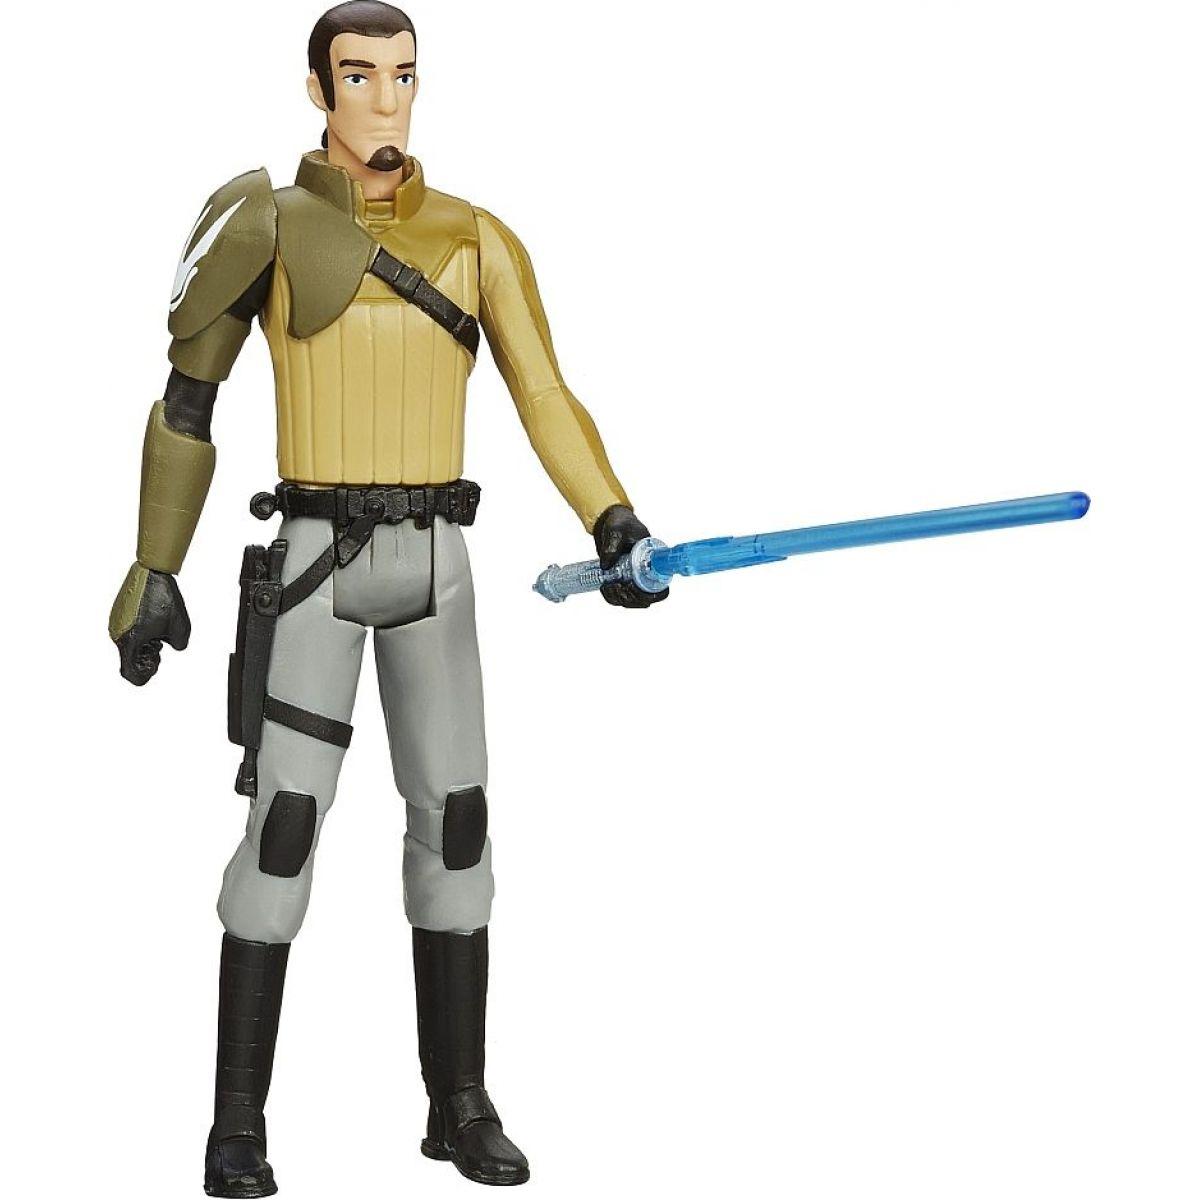 Star Wars akční figurky Hasbro A3857 - Kanan Jarrus